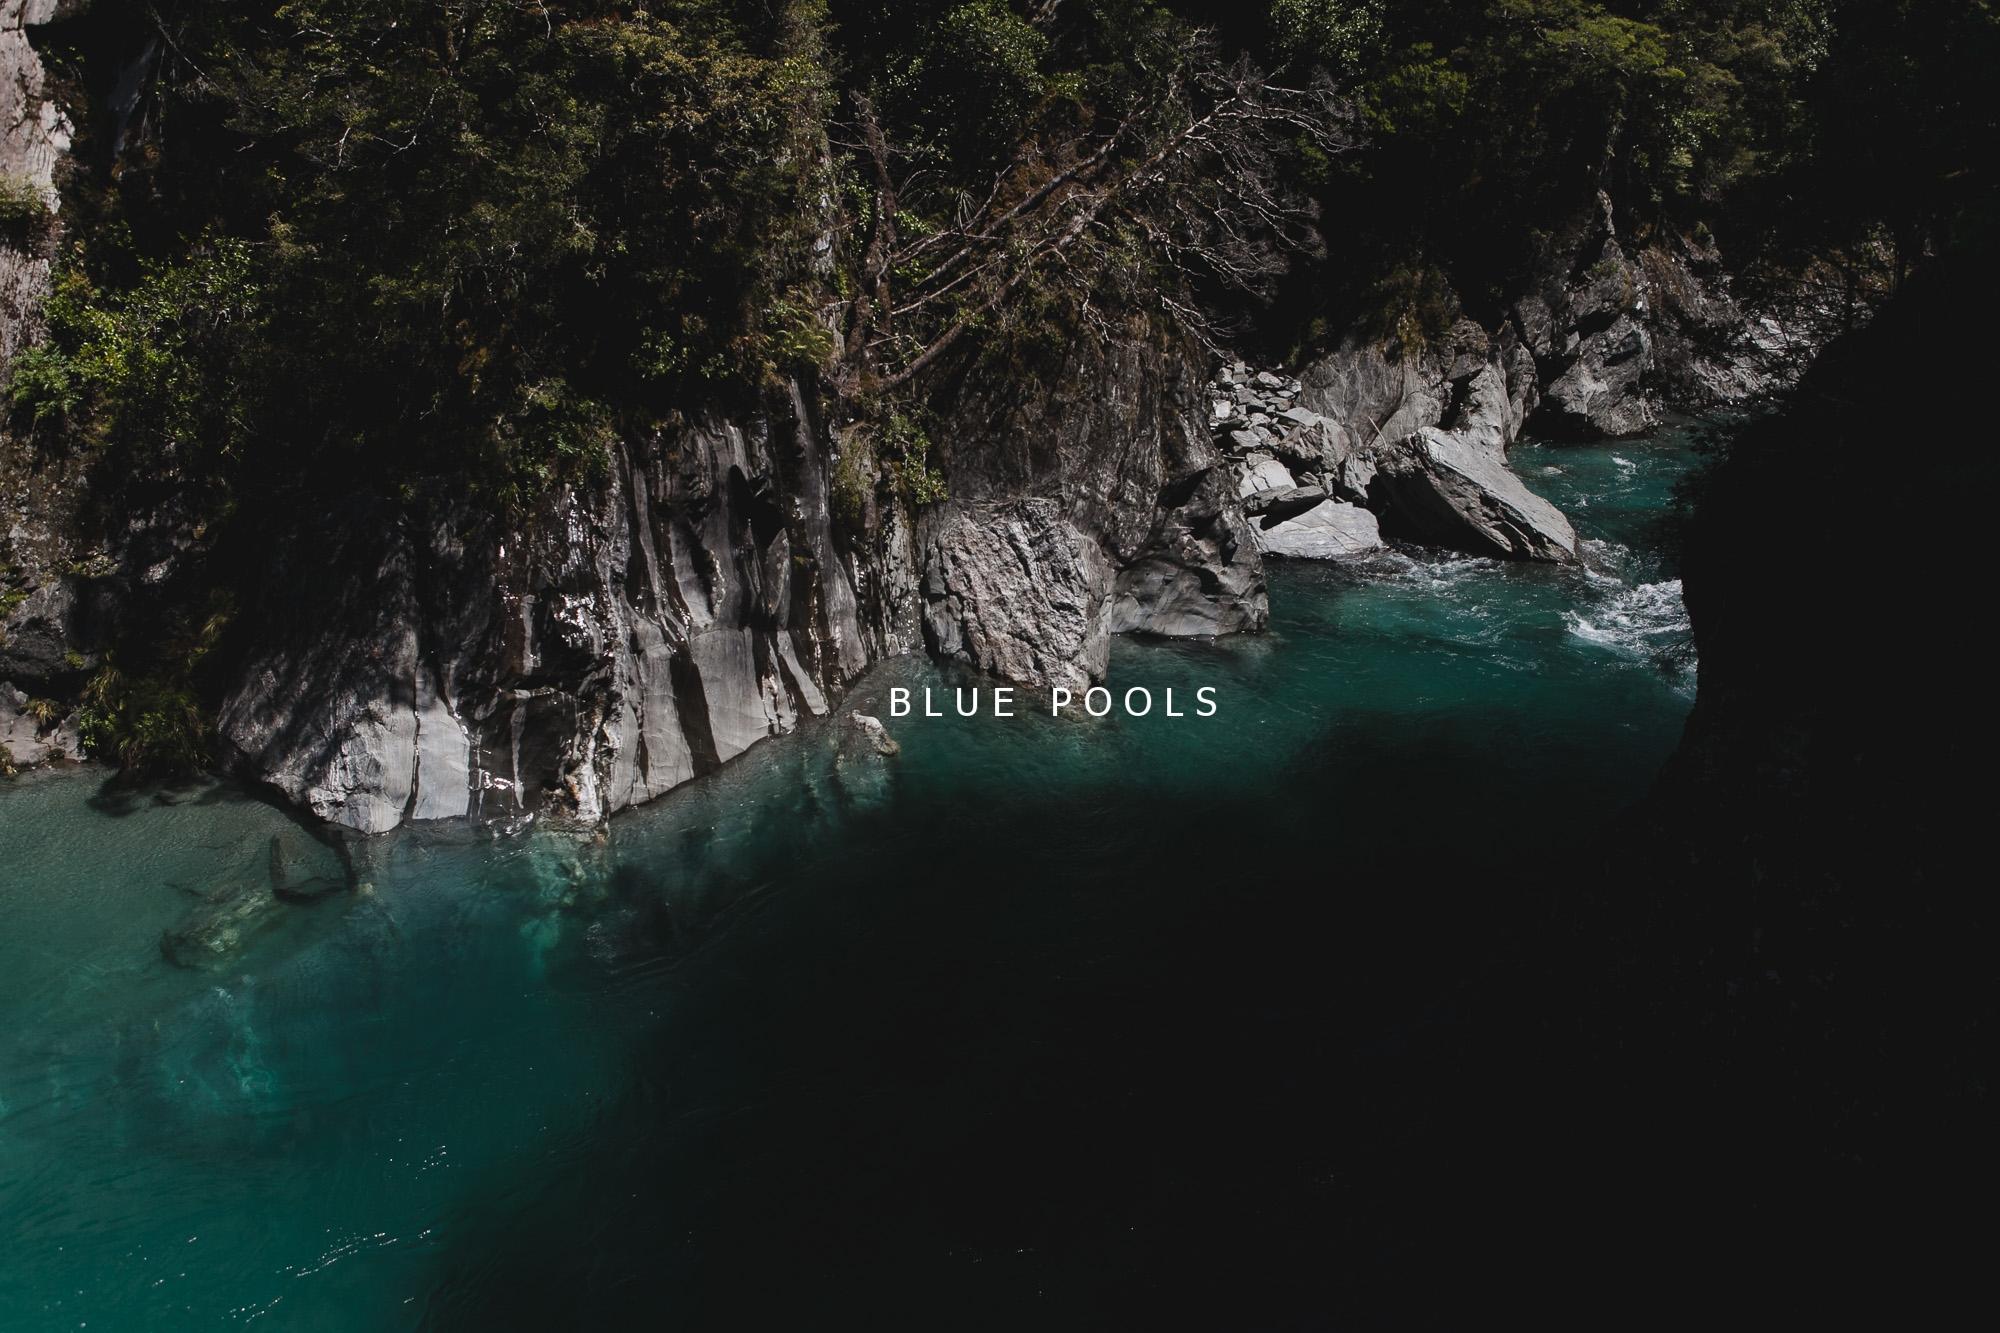 blue-pools-new-zealand-001.jpg